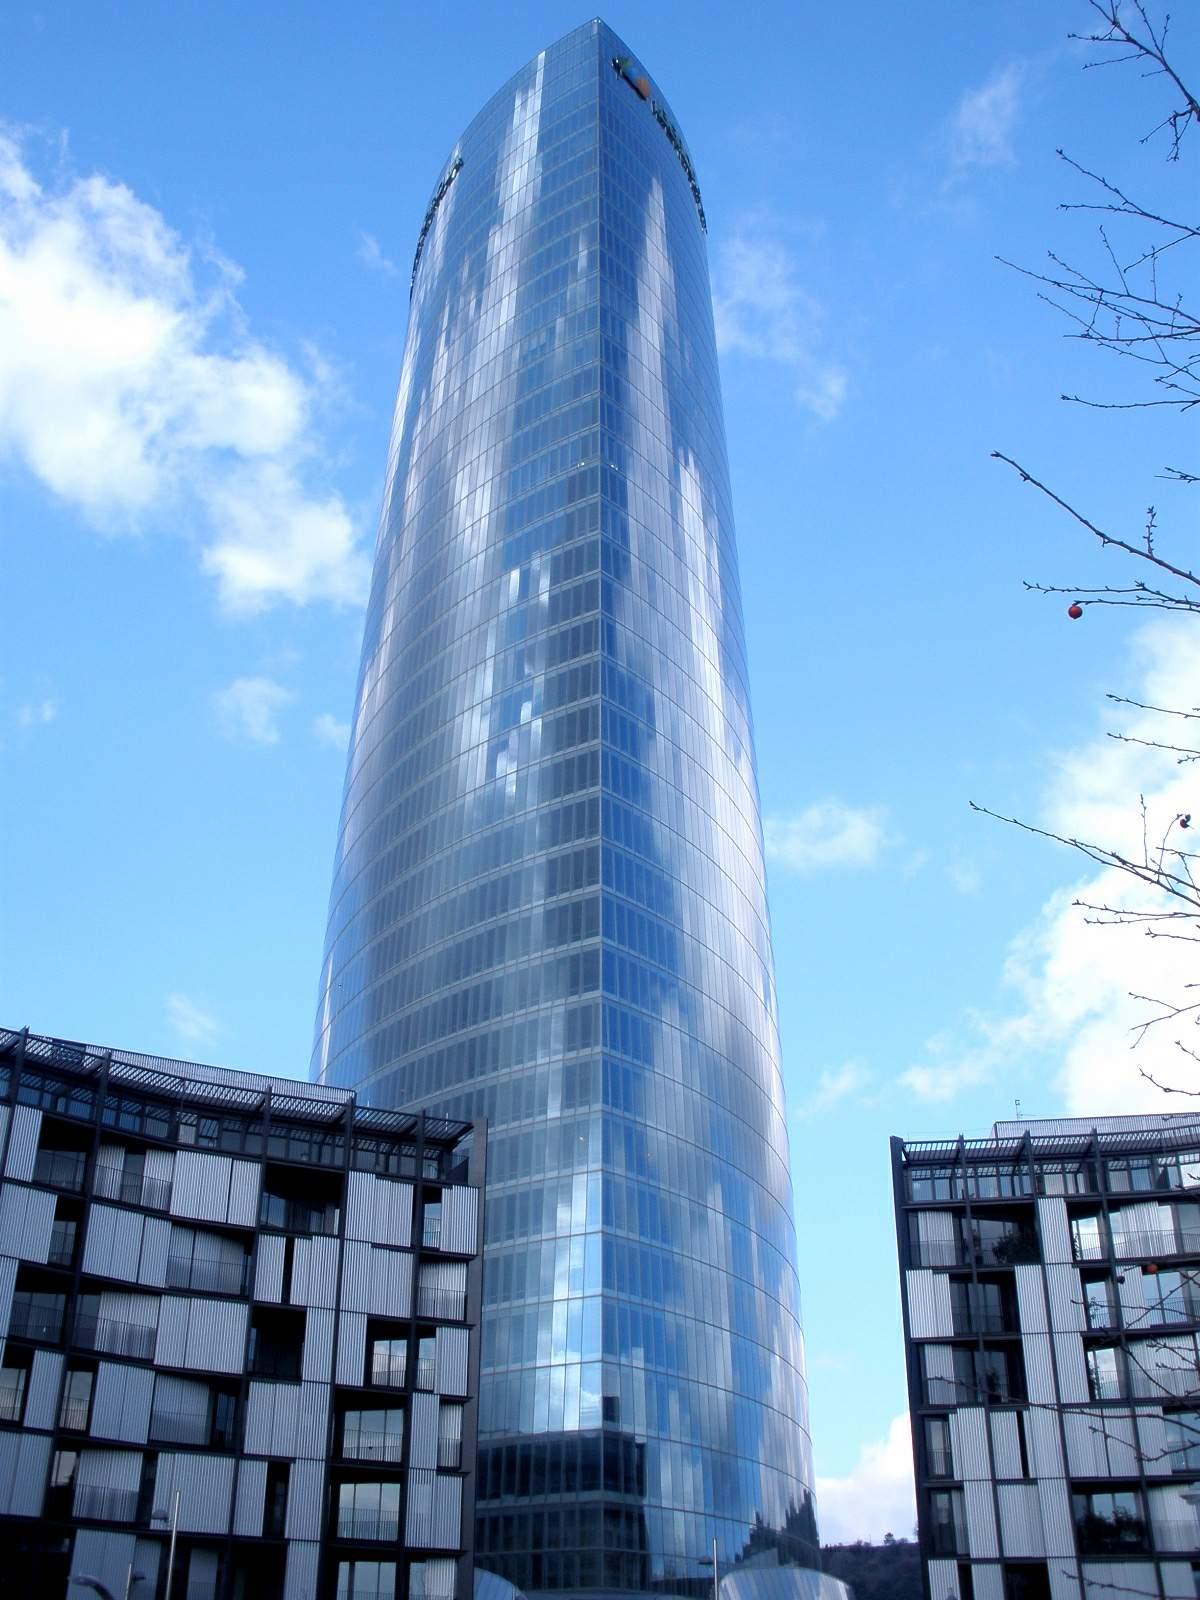 Commercial Buildings For Sale Denver Colorado